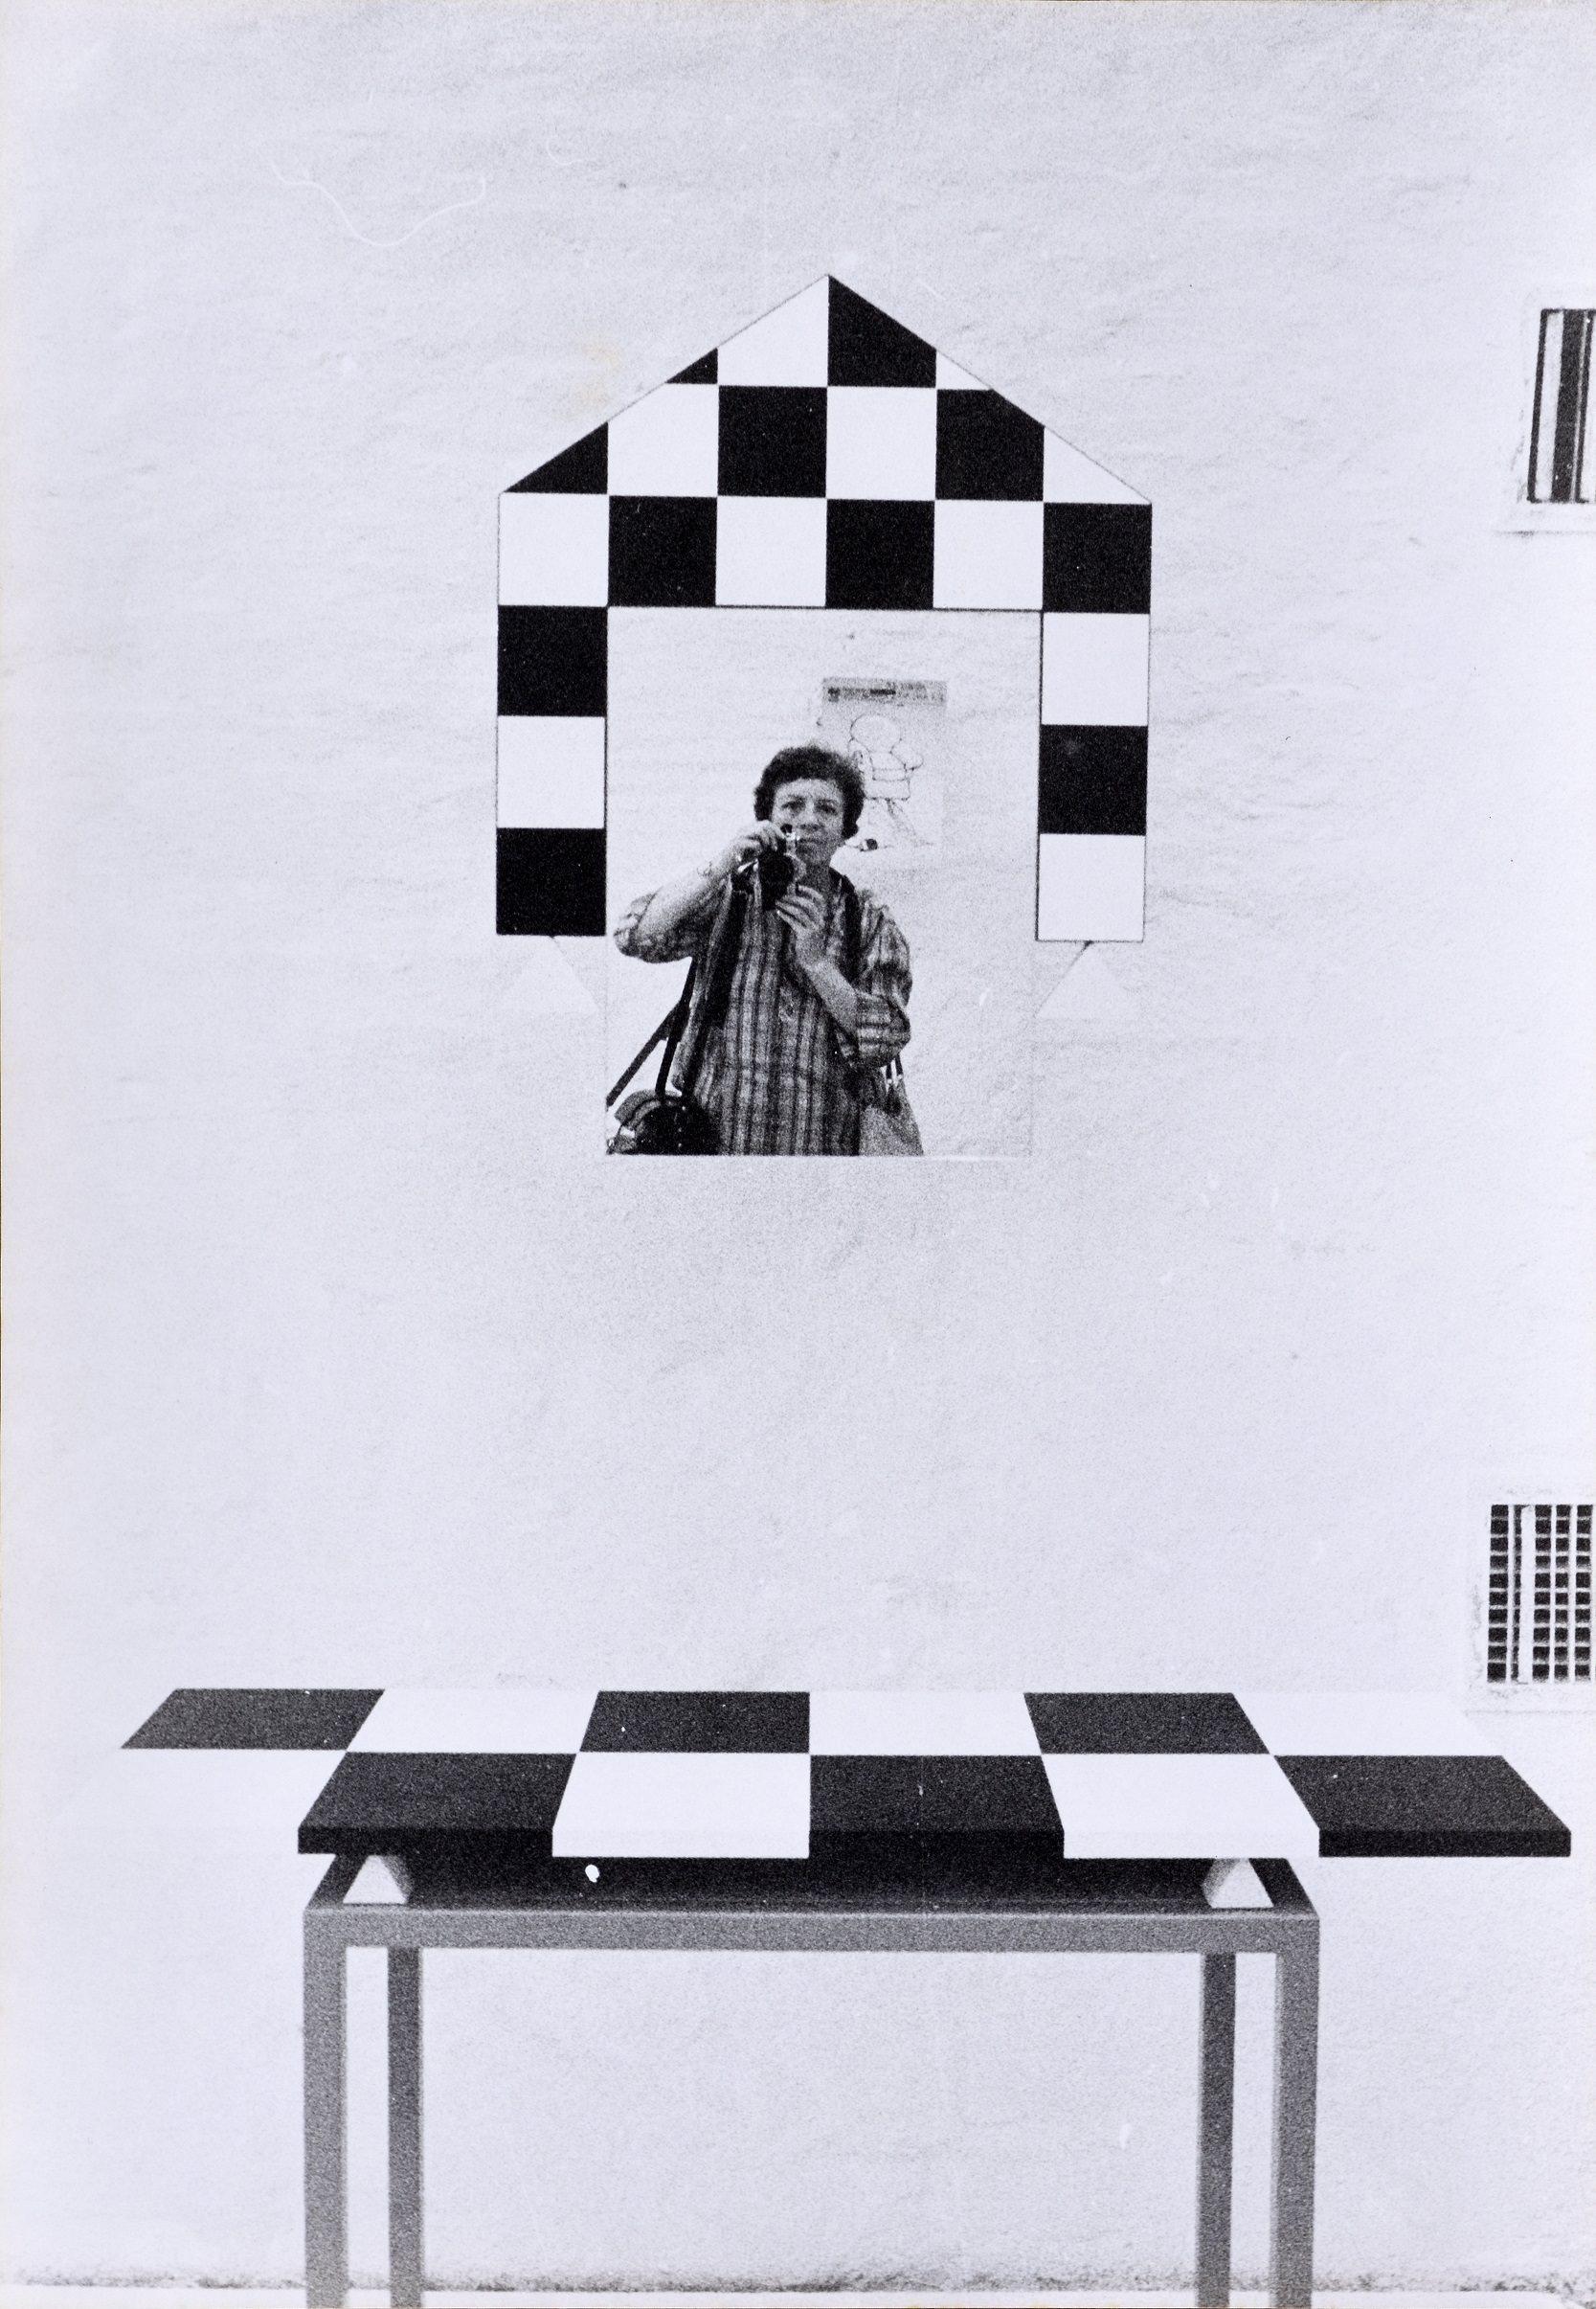 Nádor Katalin: Cím nélkül, c. 1970 © Nádor Katalin